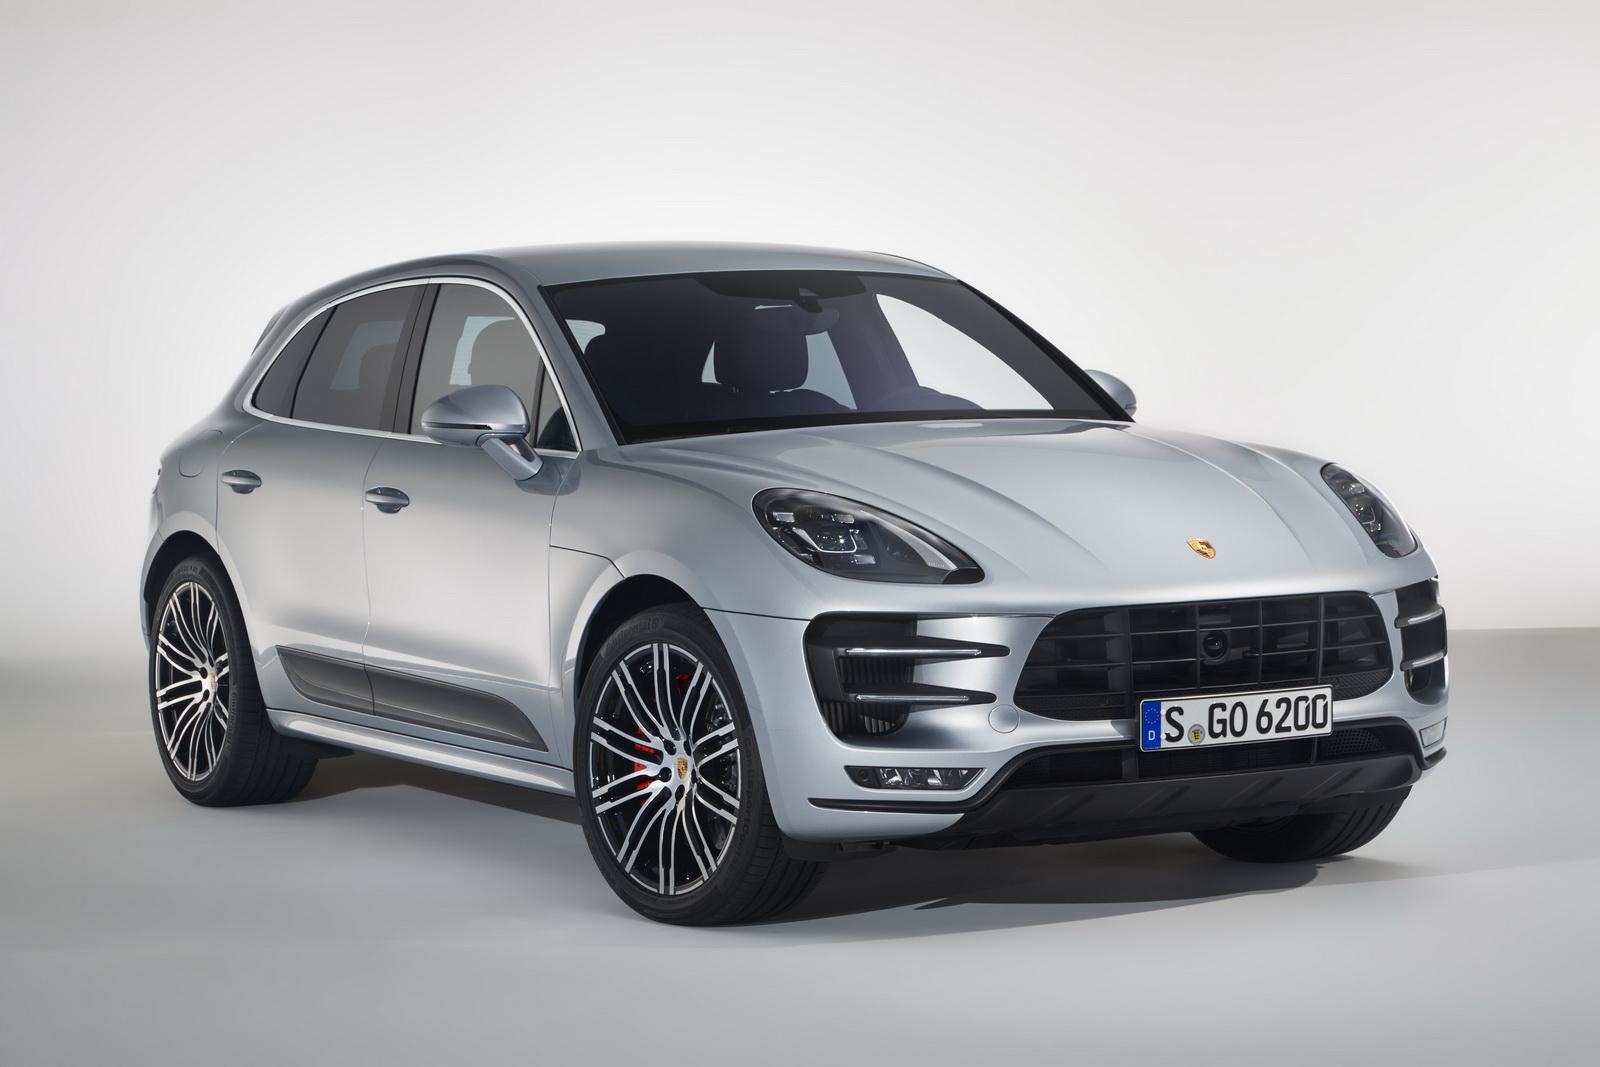 2016-PorscheMacanTurbo-PerformancePack-03